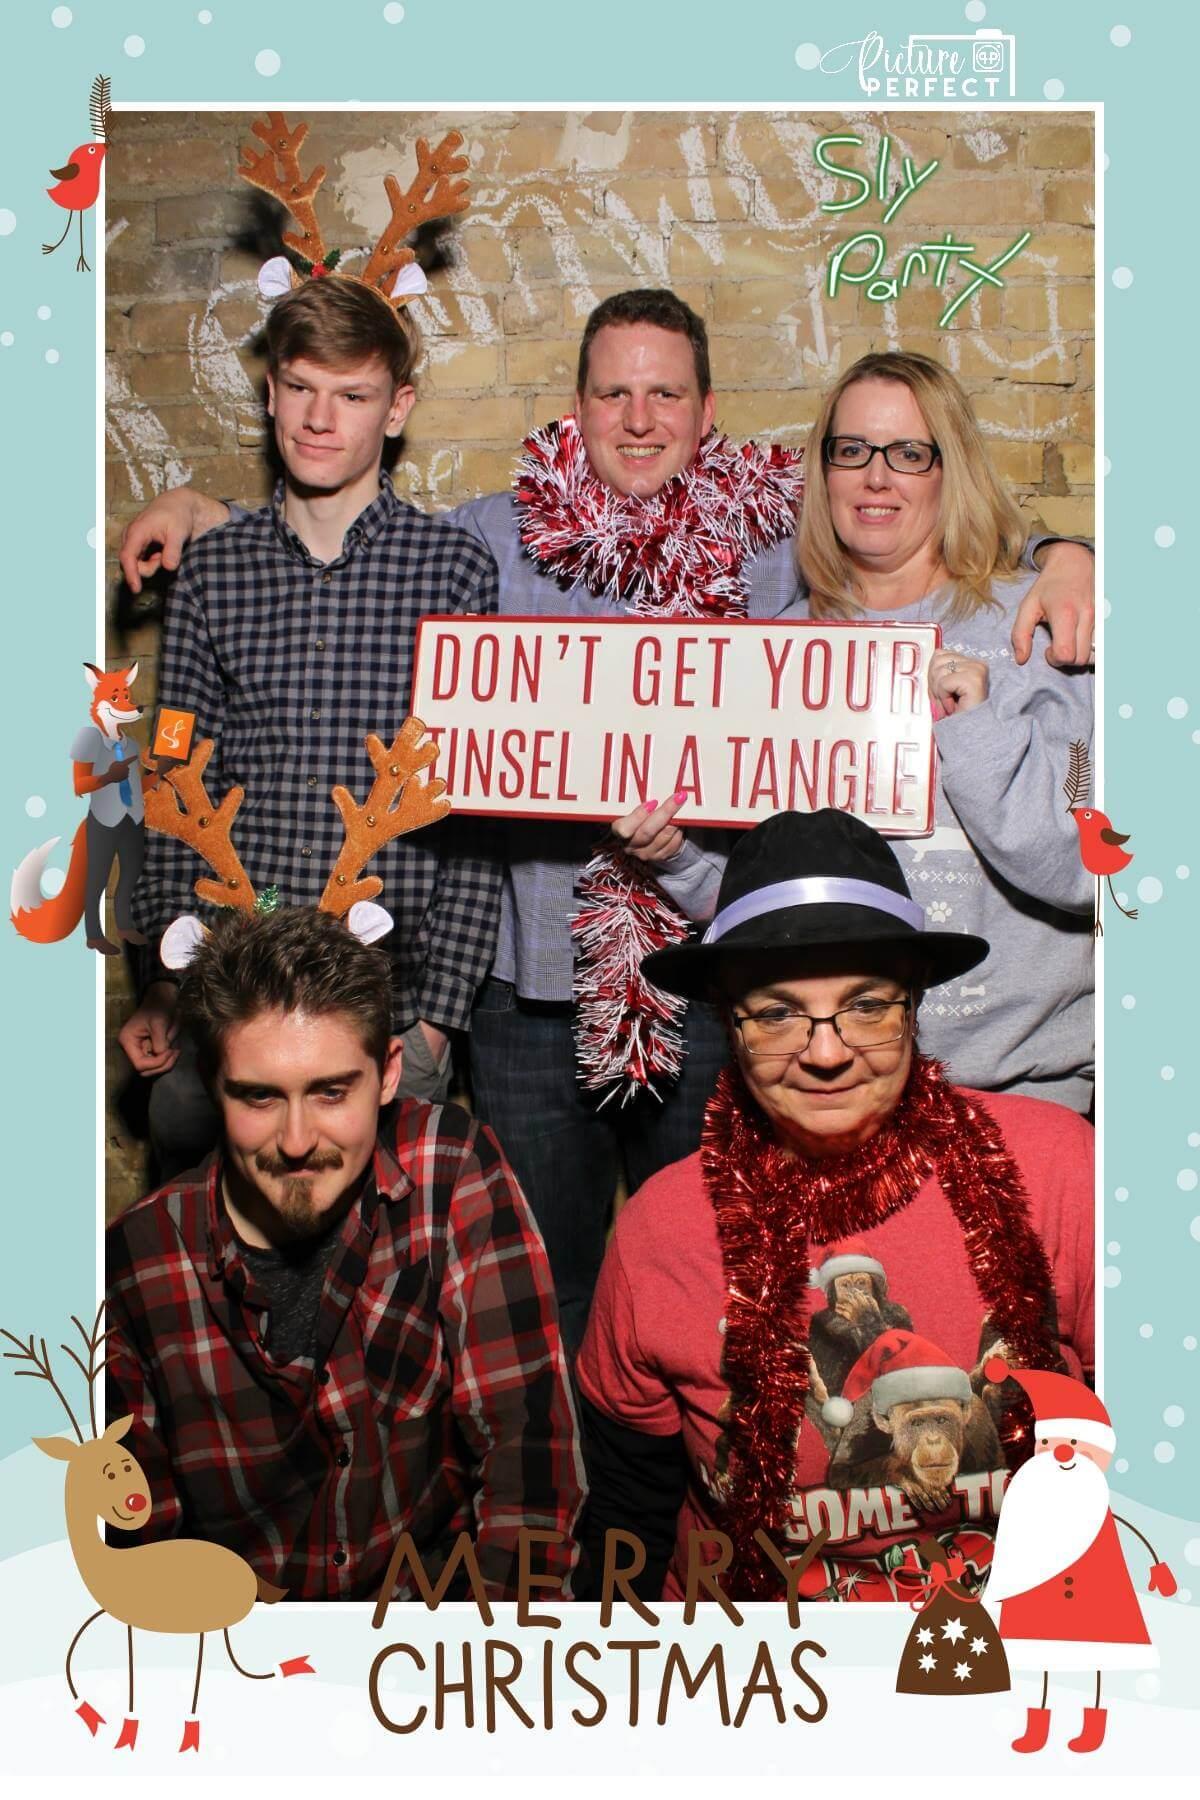 photo taken at slyfox christmas party